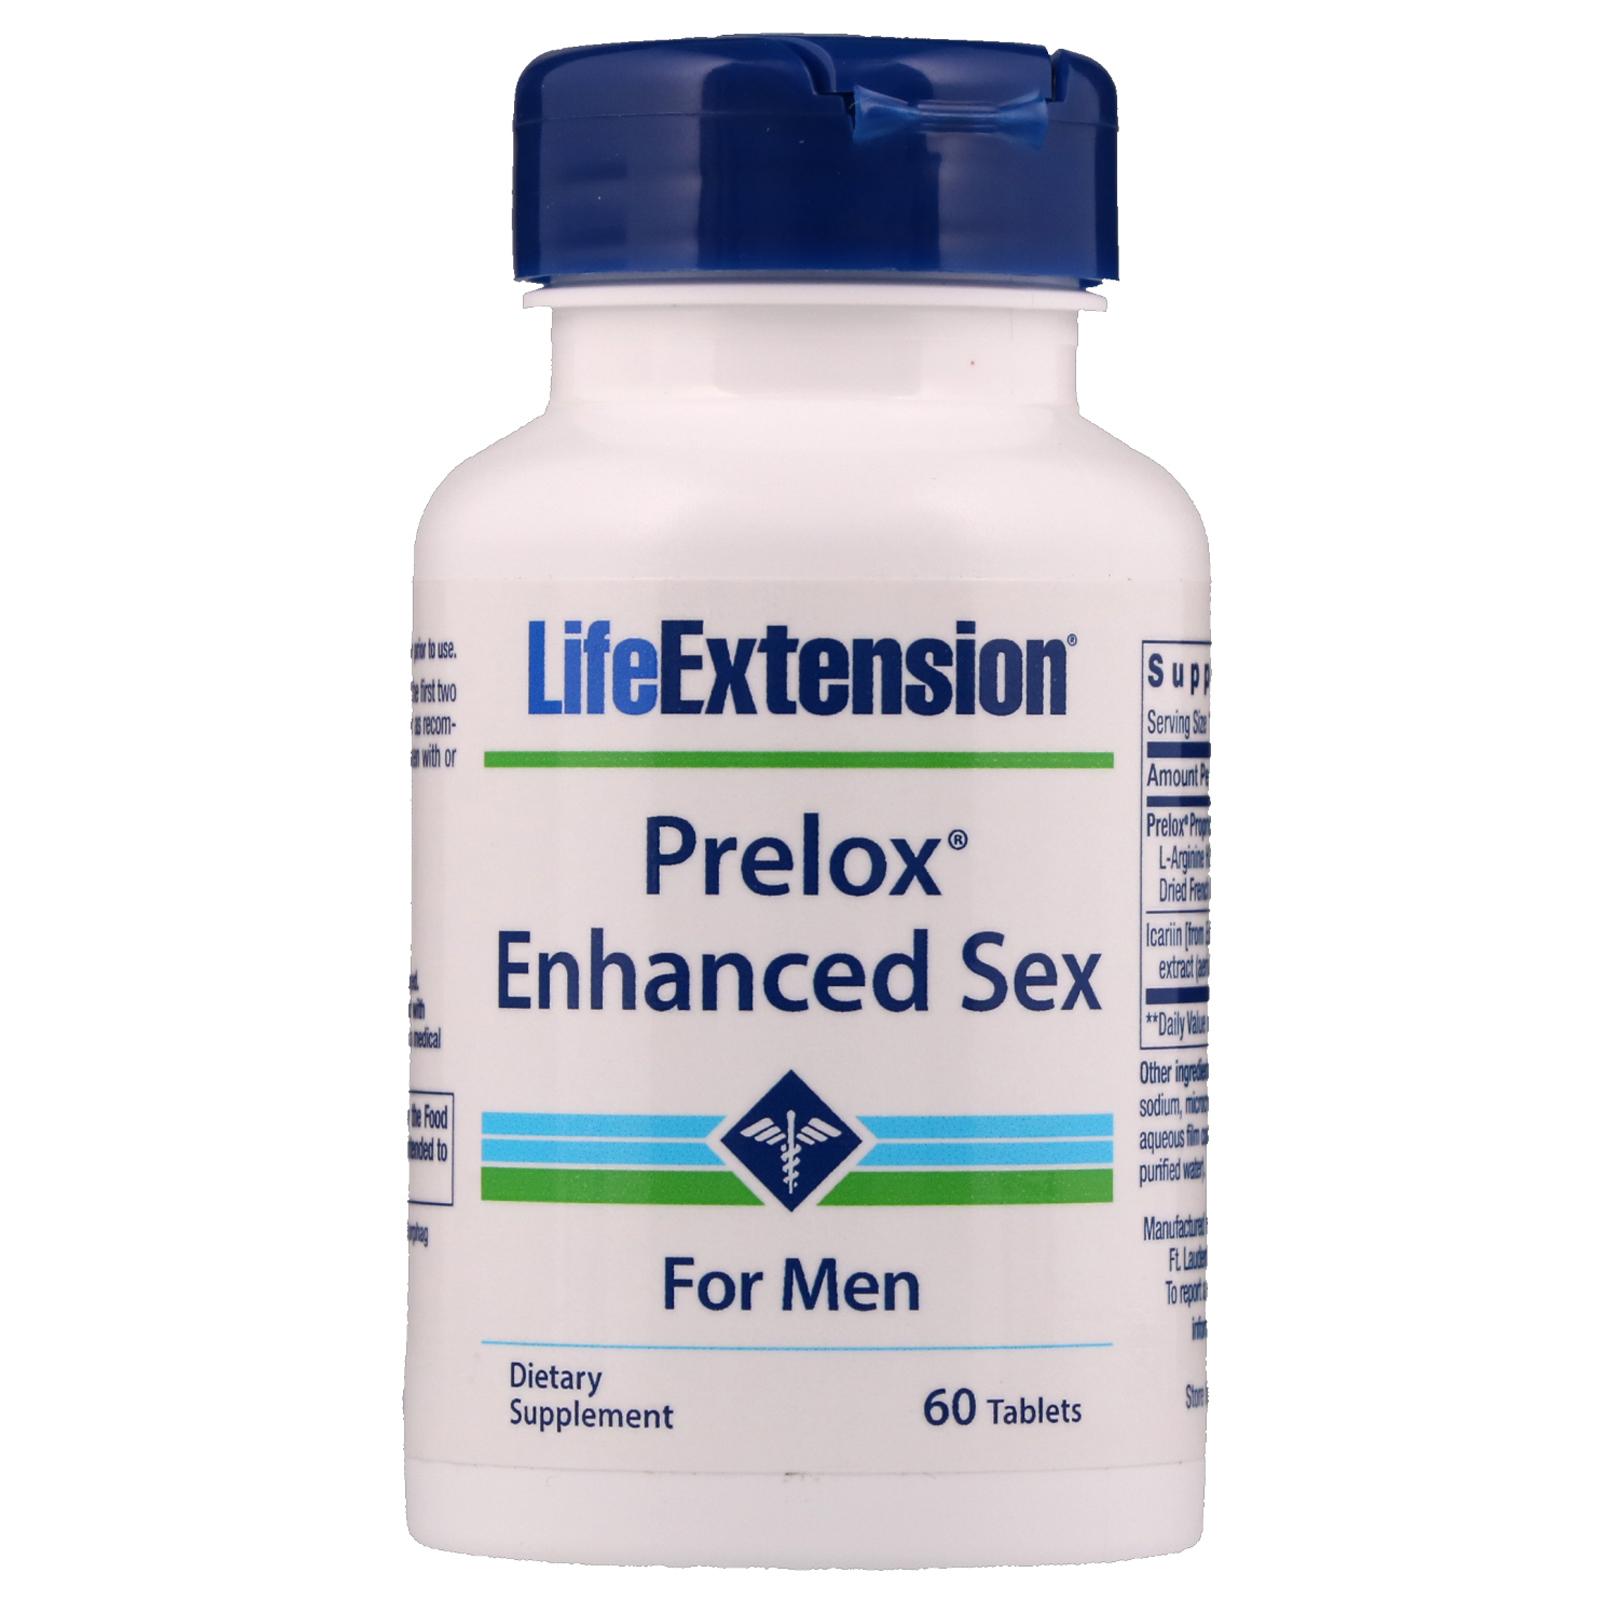 Naturual sex stimulants, mfm threesomes info